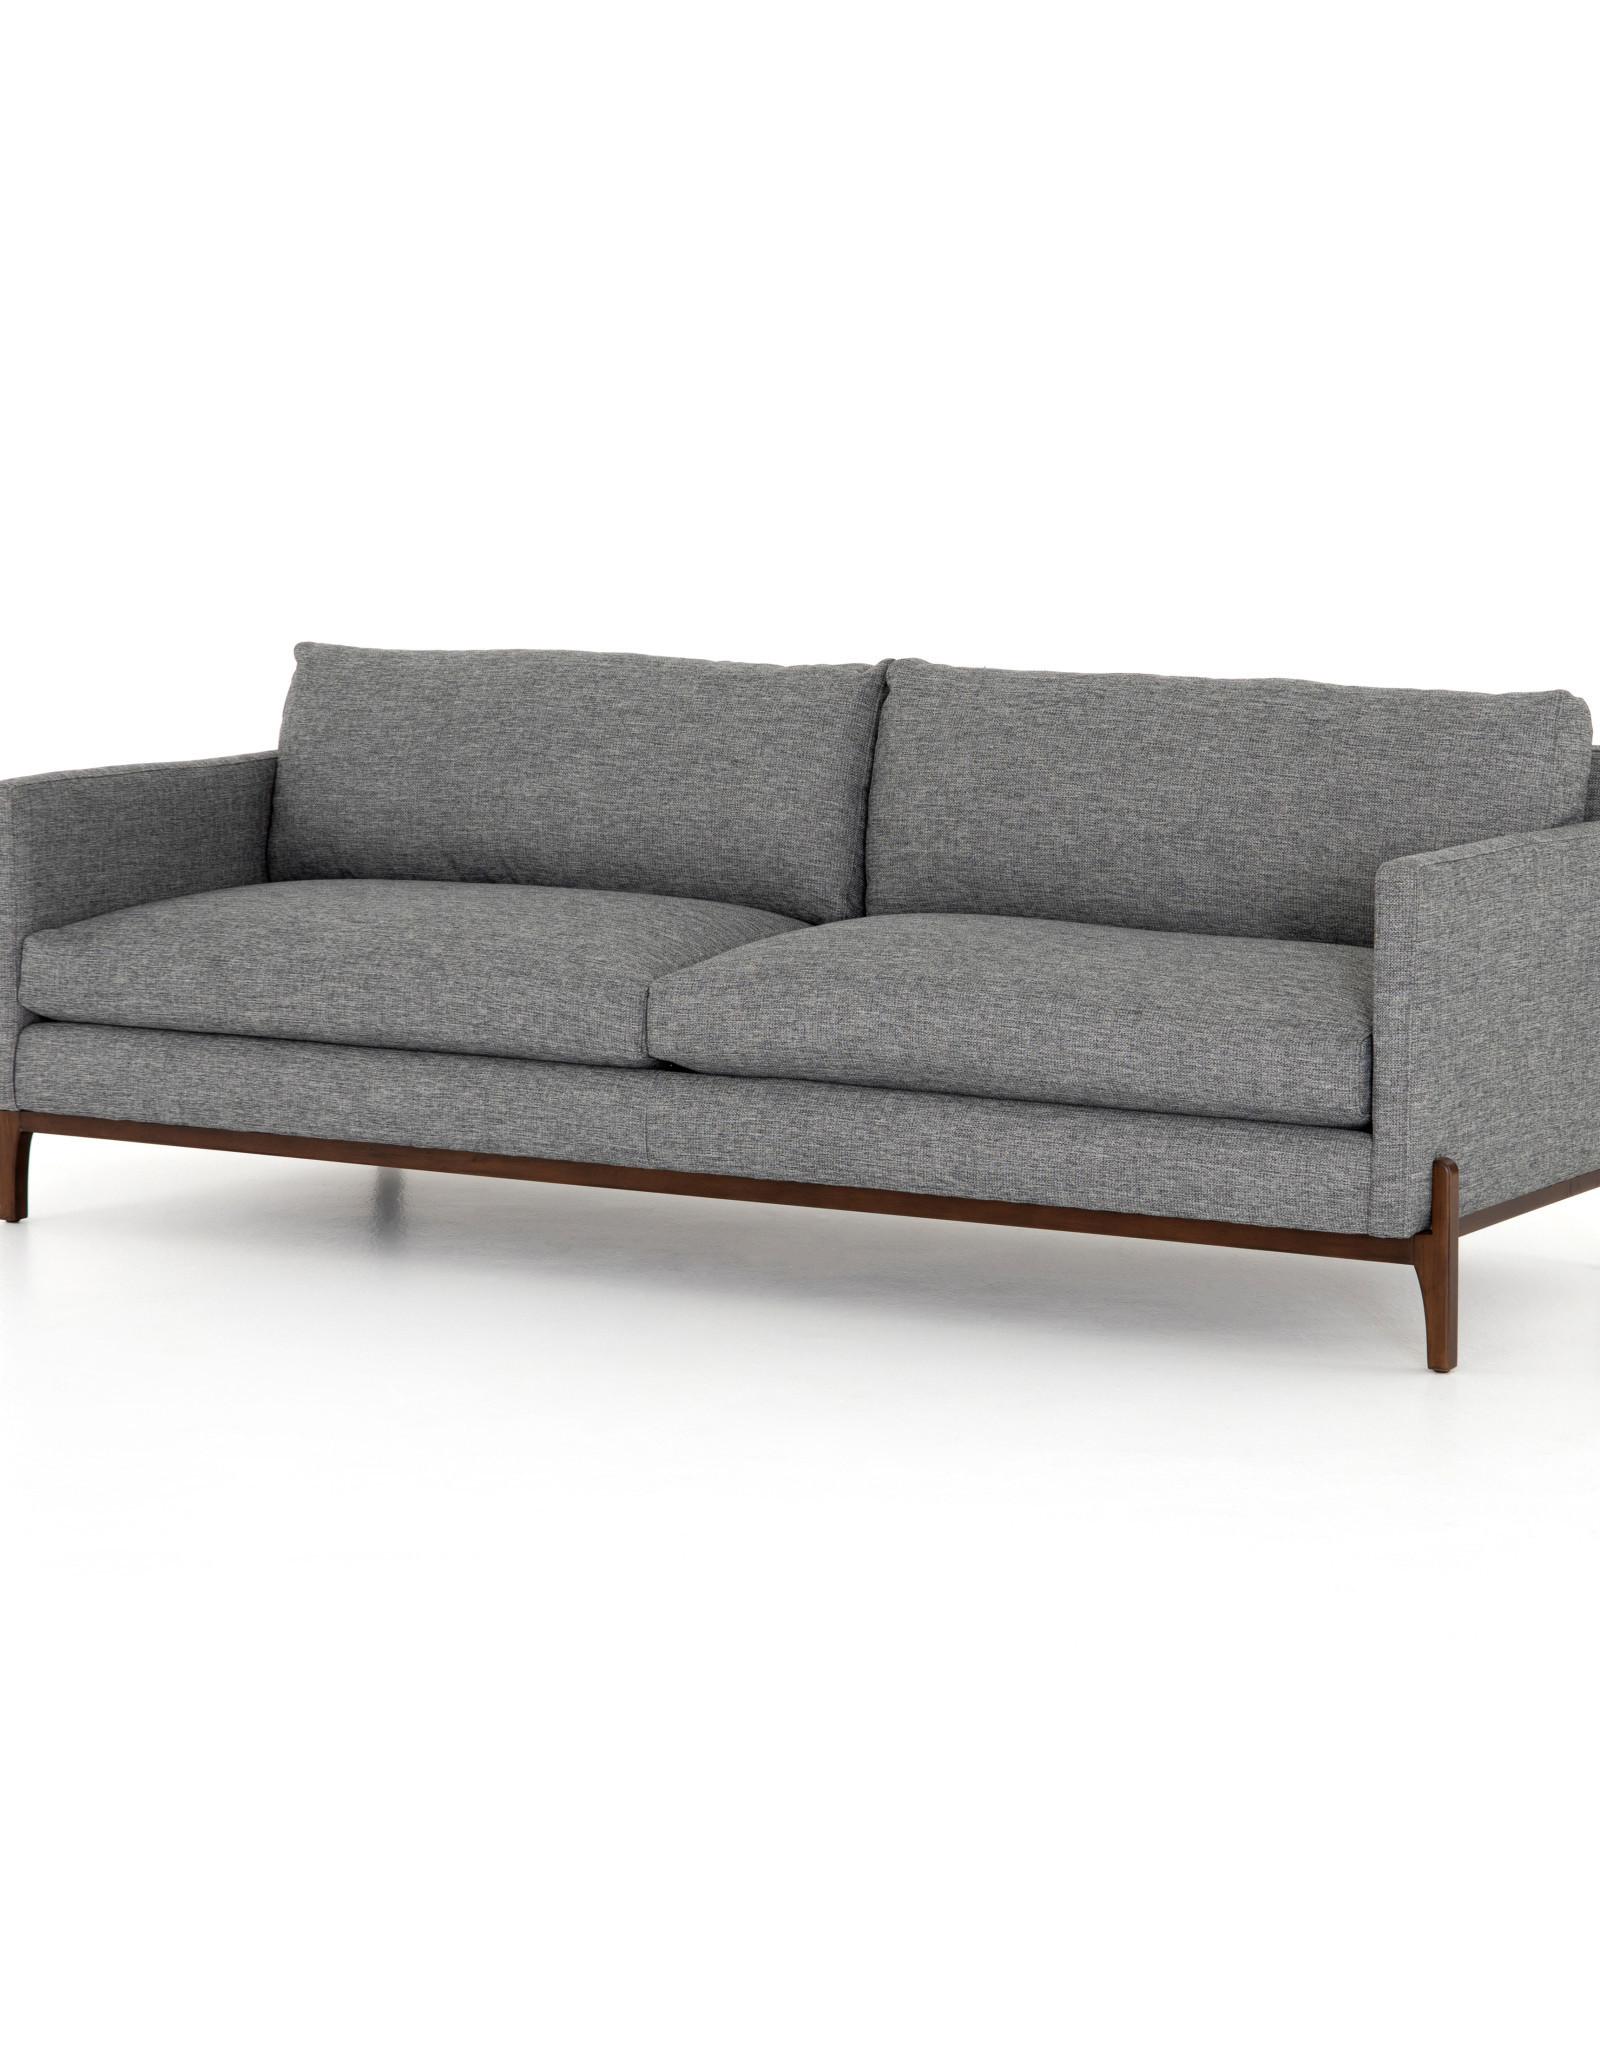 Francesca Fairflax Sofa